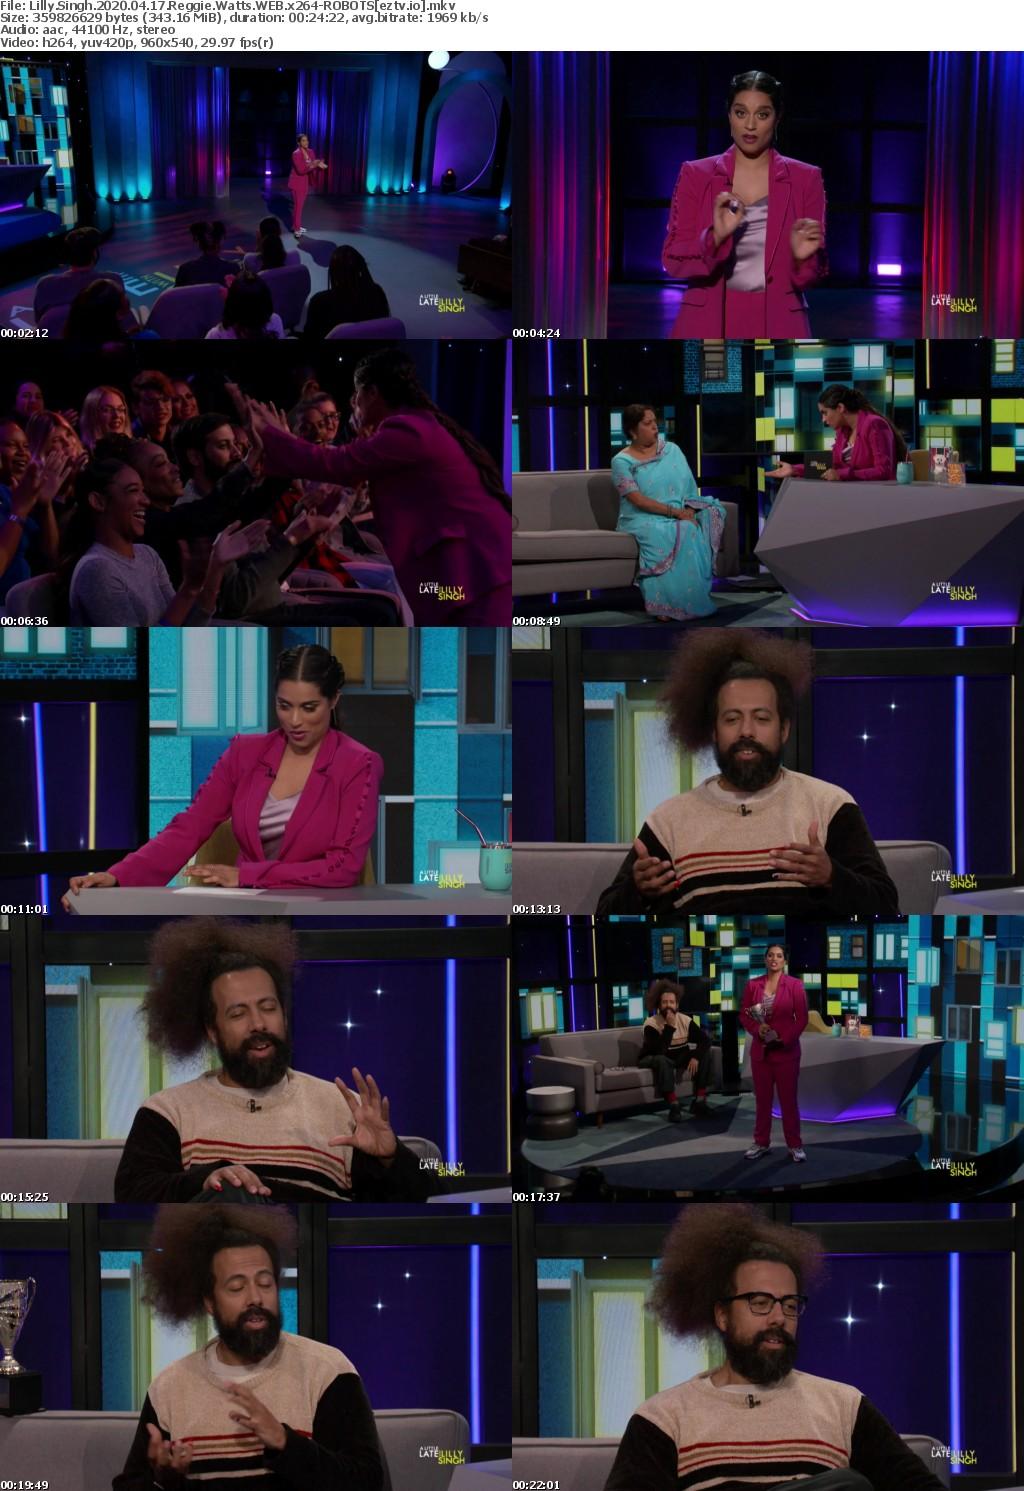 Lilly Singh 2020 04 17 Reggie Watts WEB x264-ROBOTS